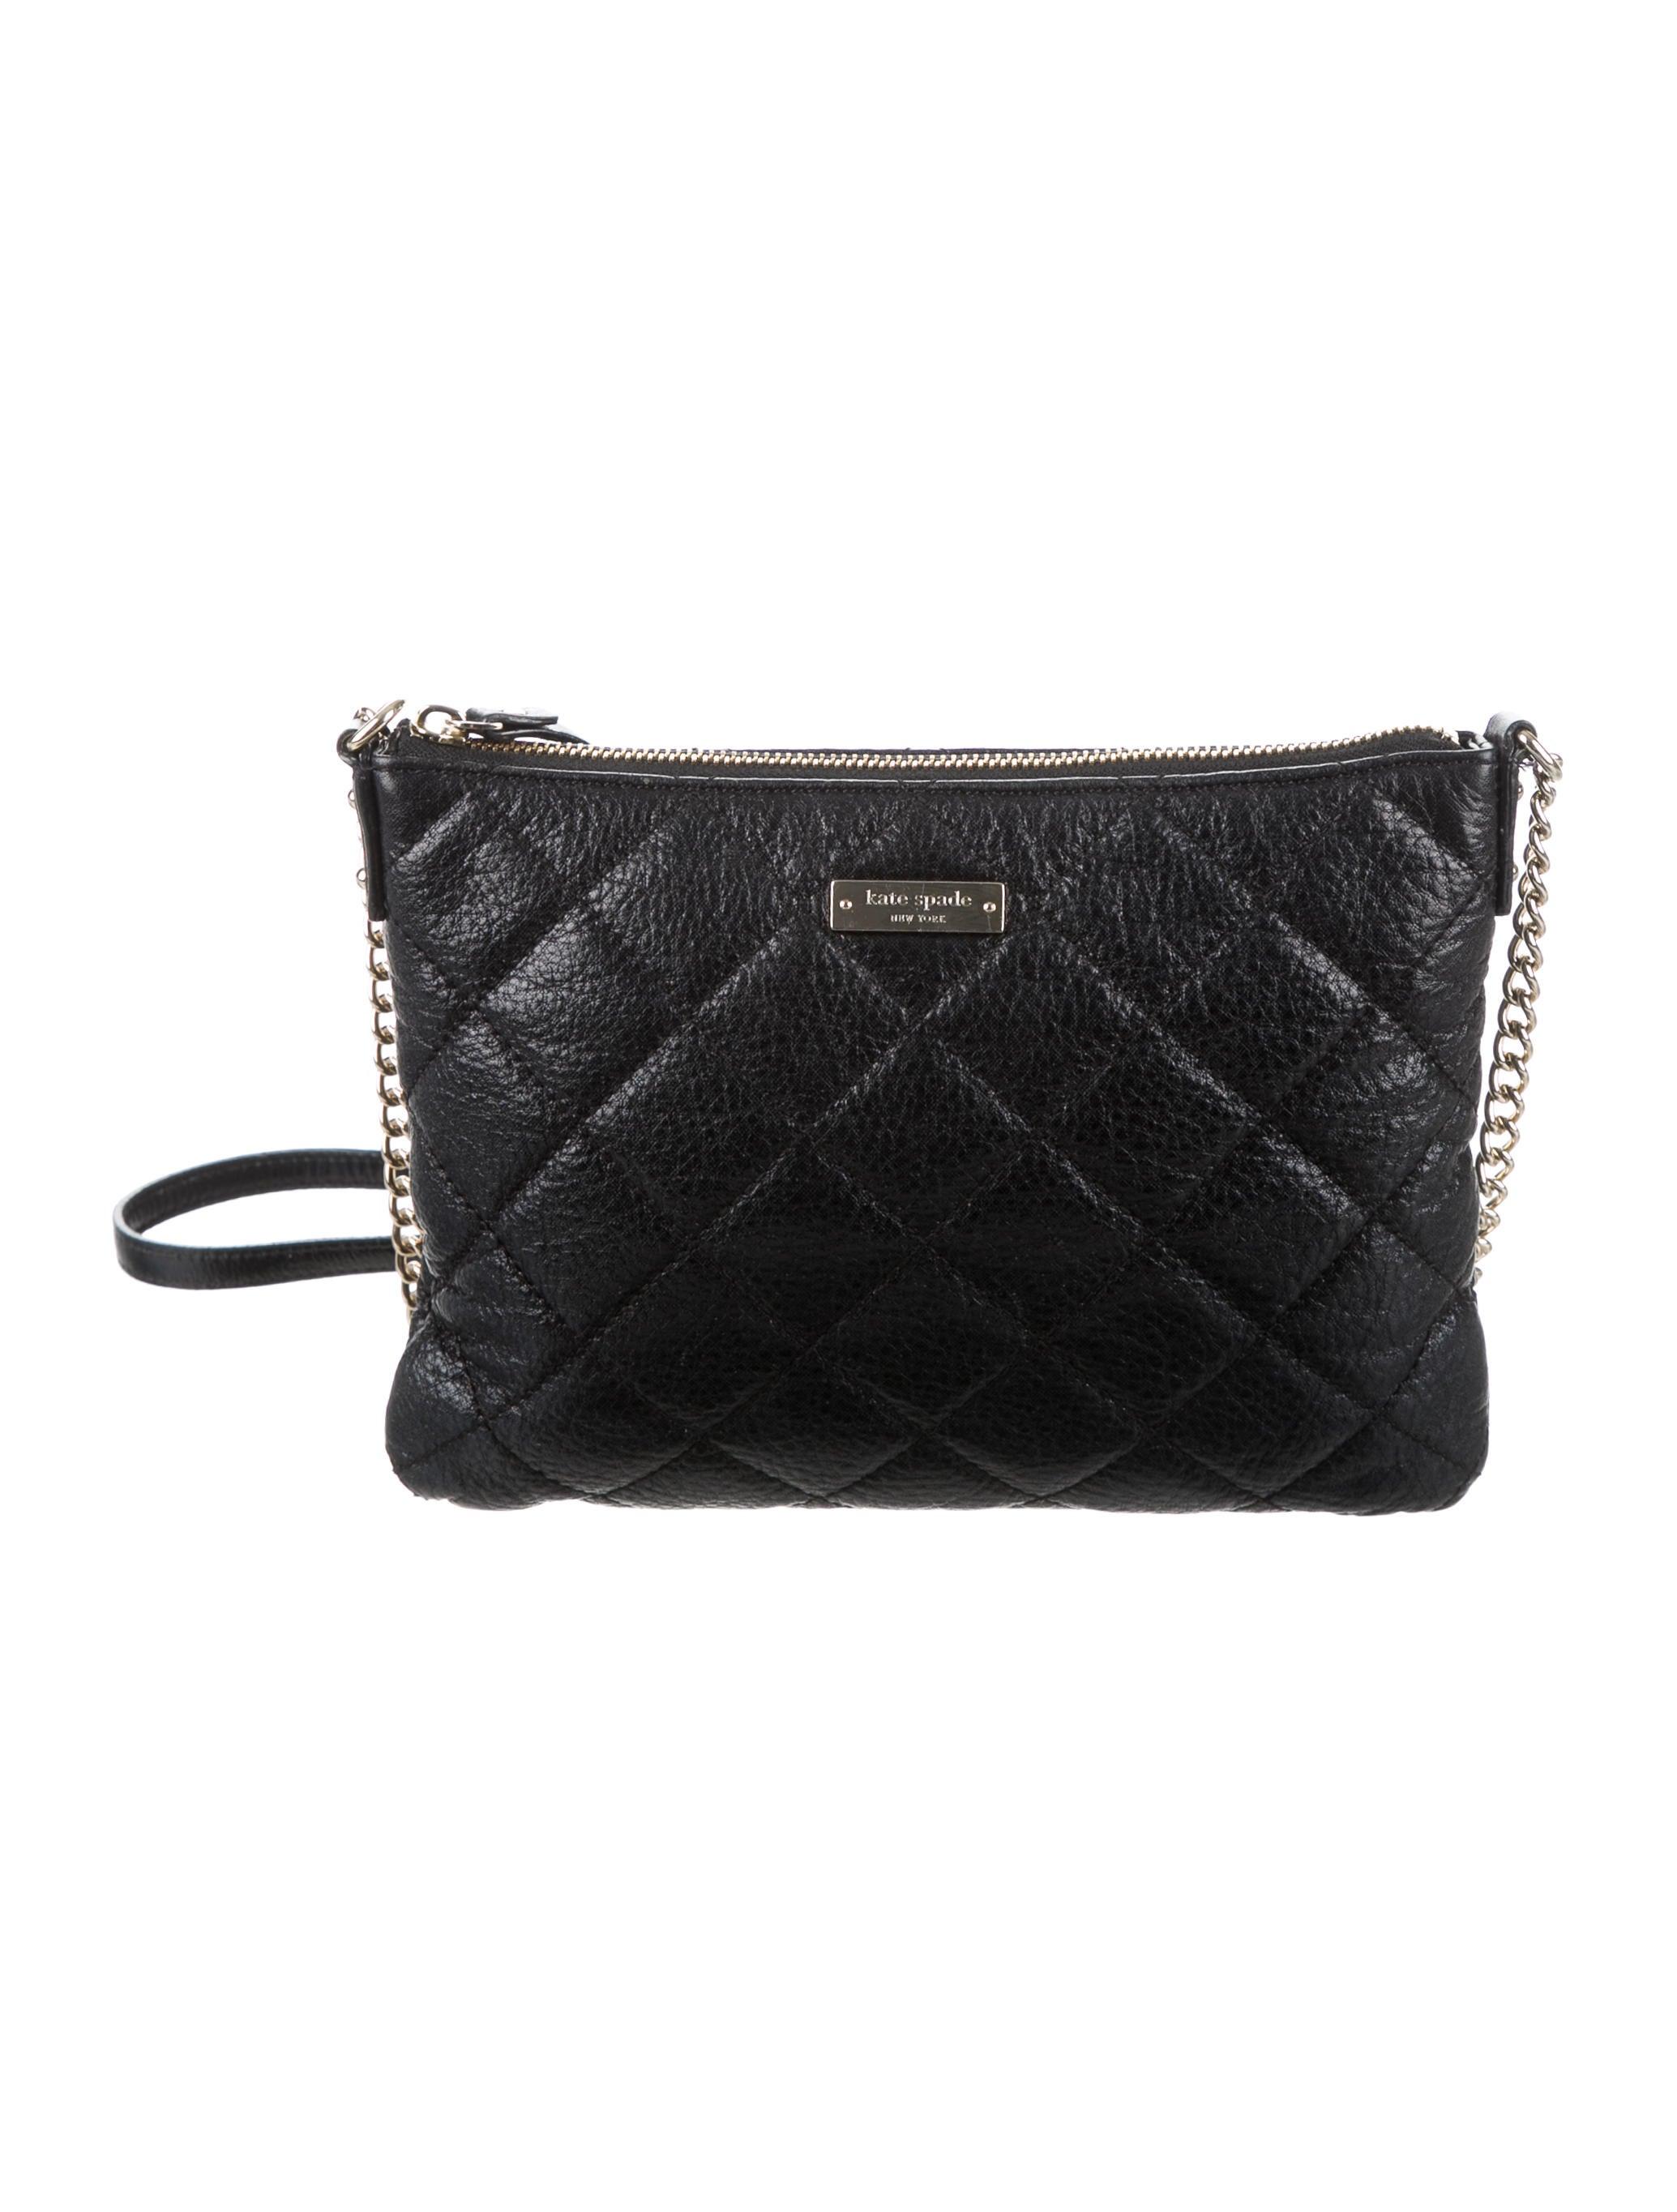 Kate Spade New York Gold Coast Ginnie Bag Handbags  : WKA552581enlarged from www.therealreal.com size 2069 x 2729 jpeg 284kB